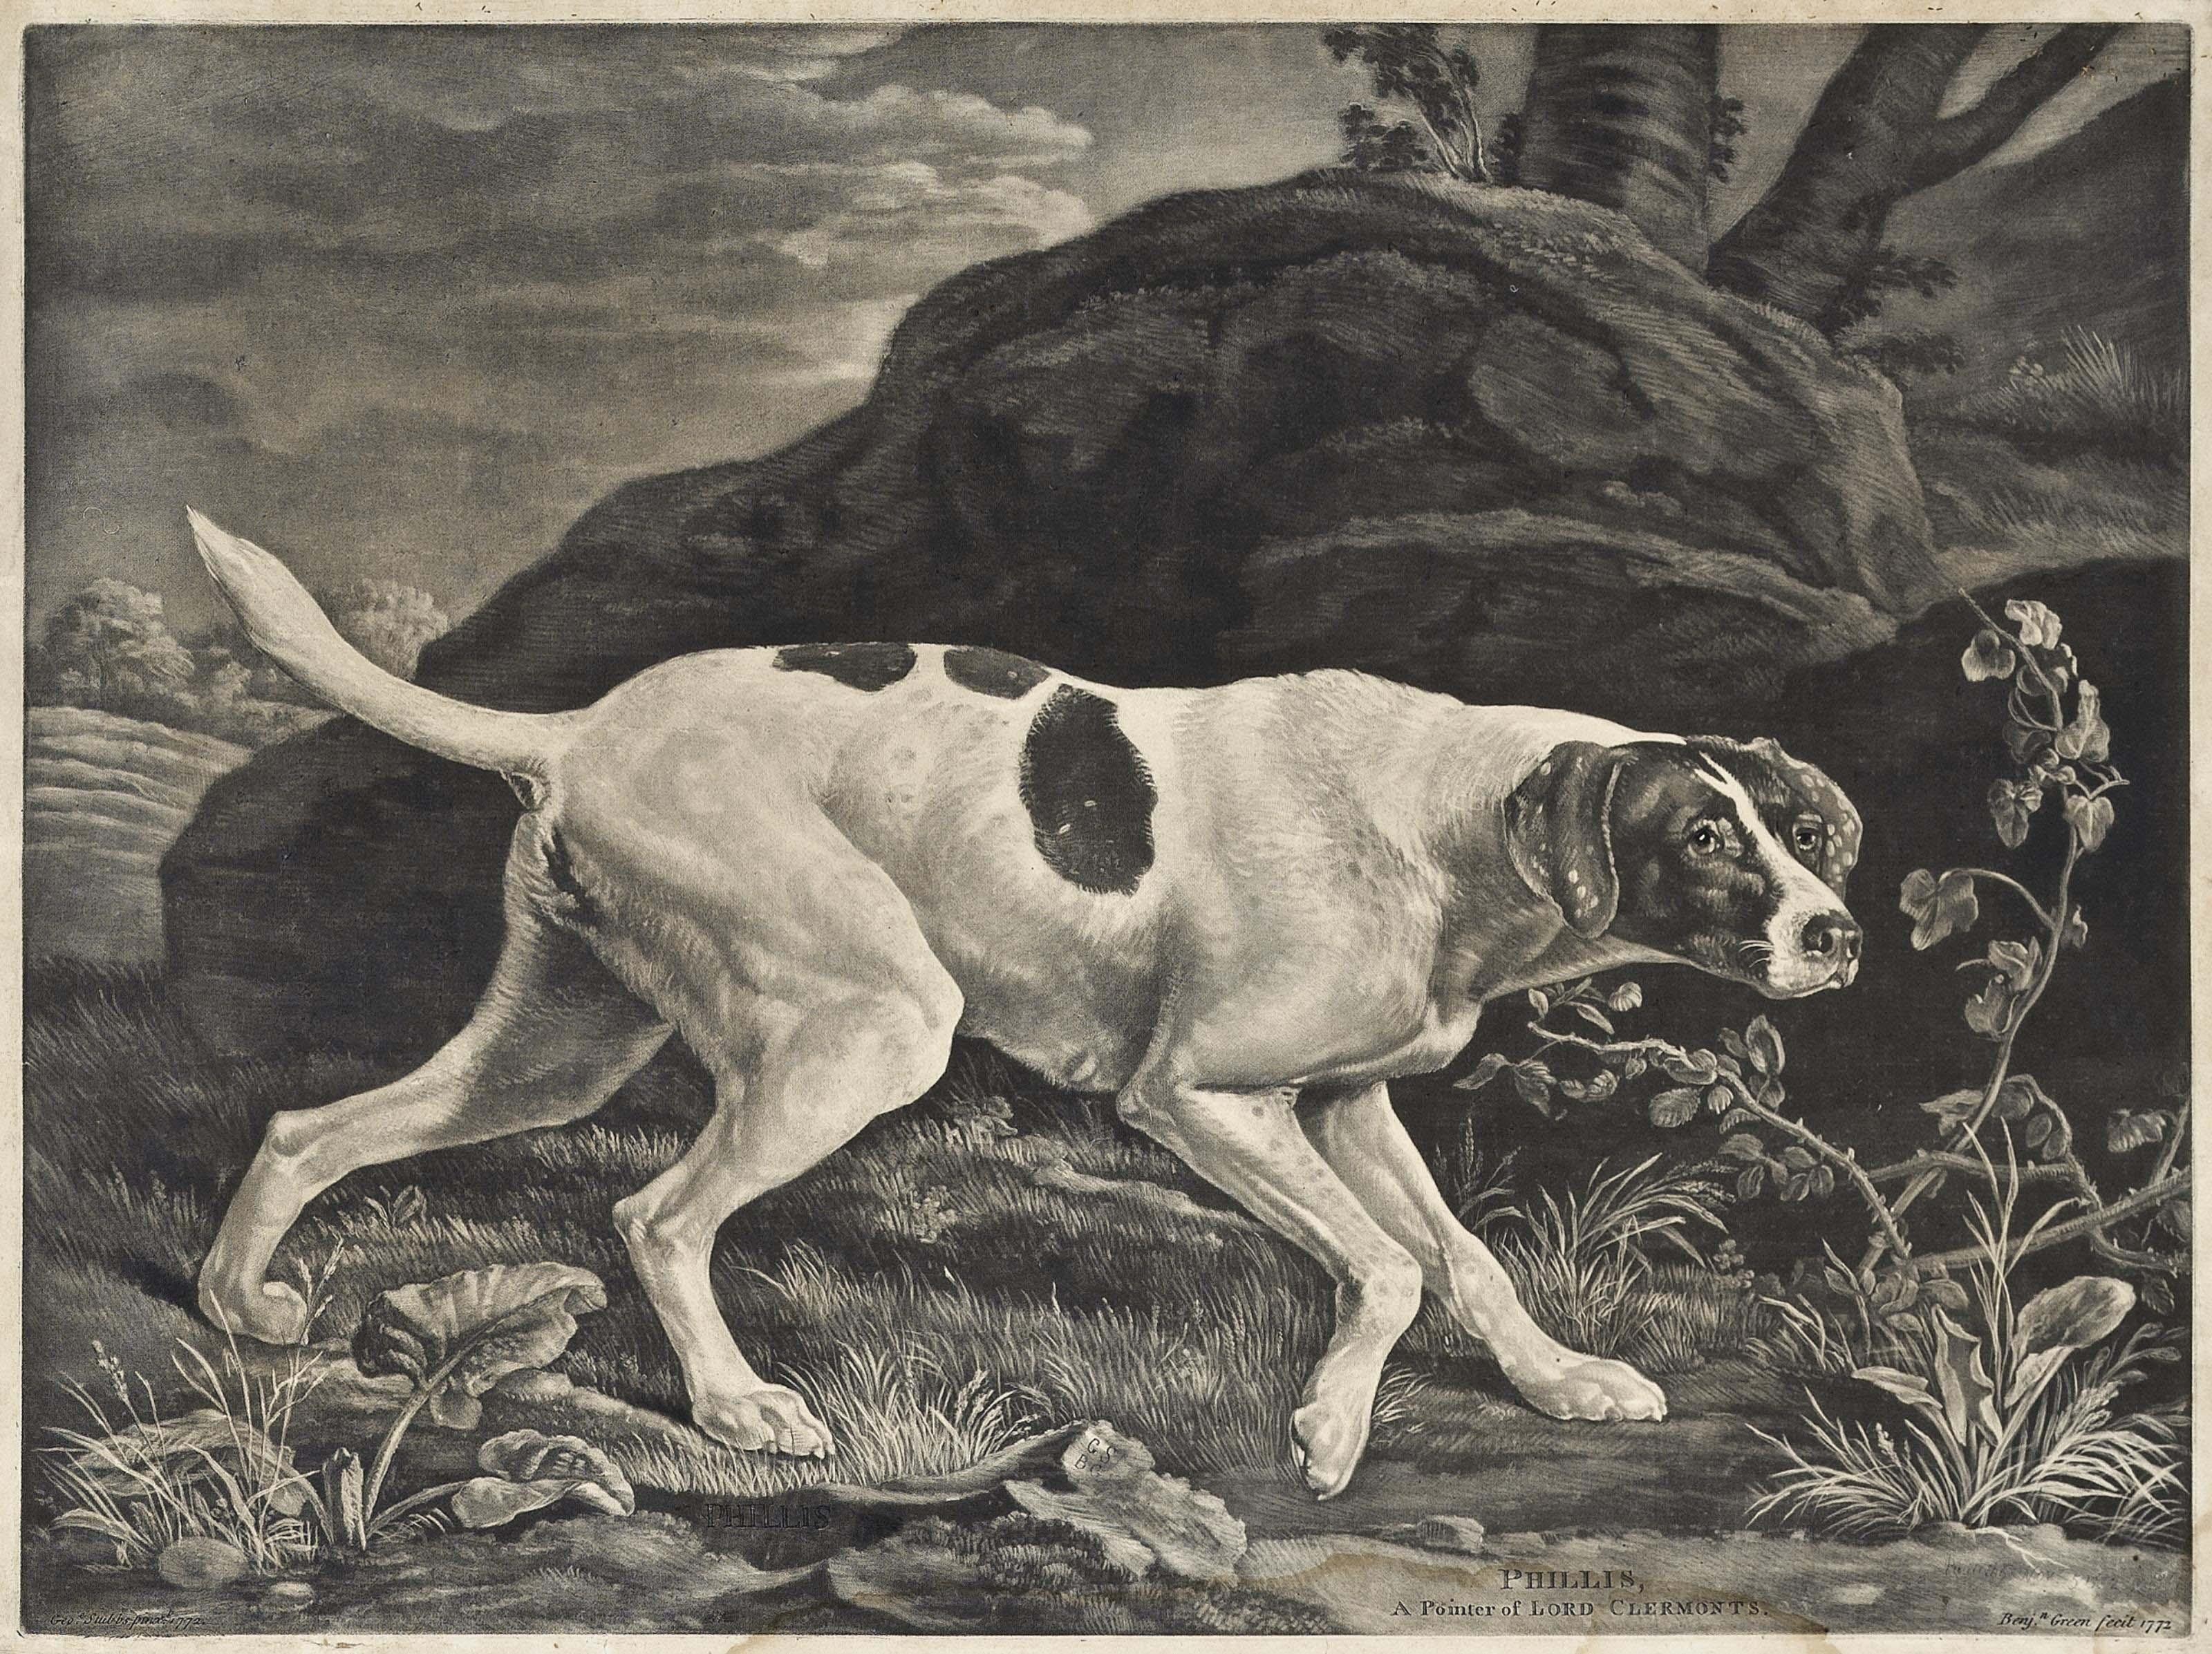 Benjamin Green (1739-1813), after George Stubbs